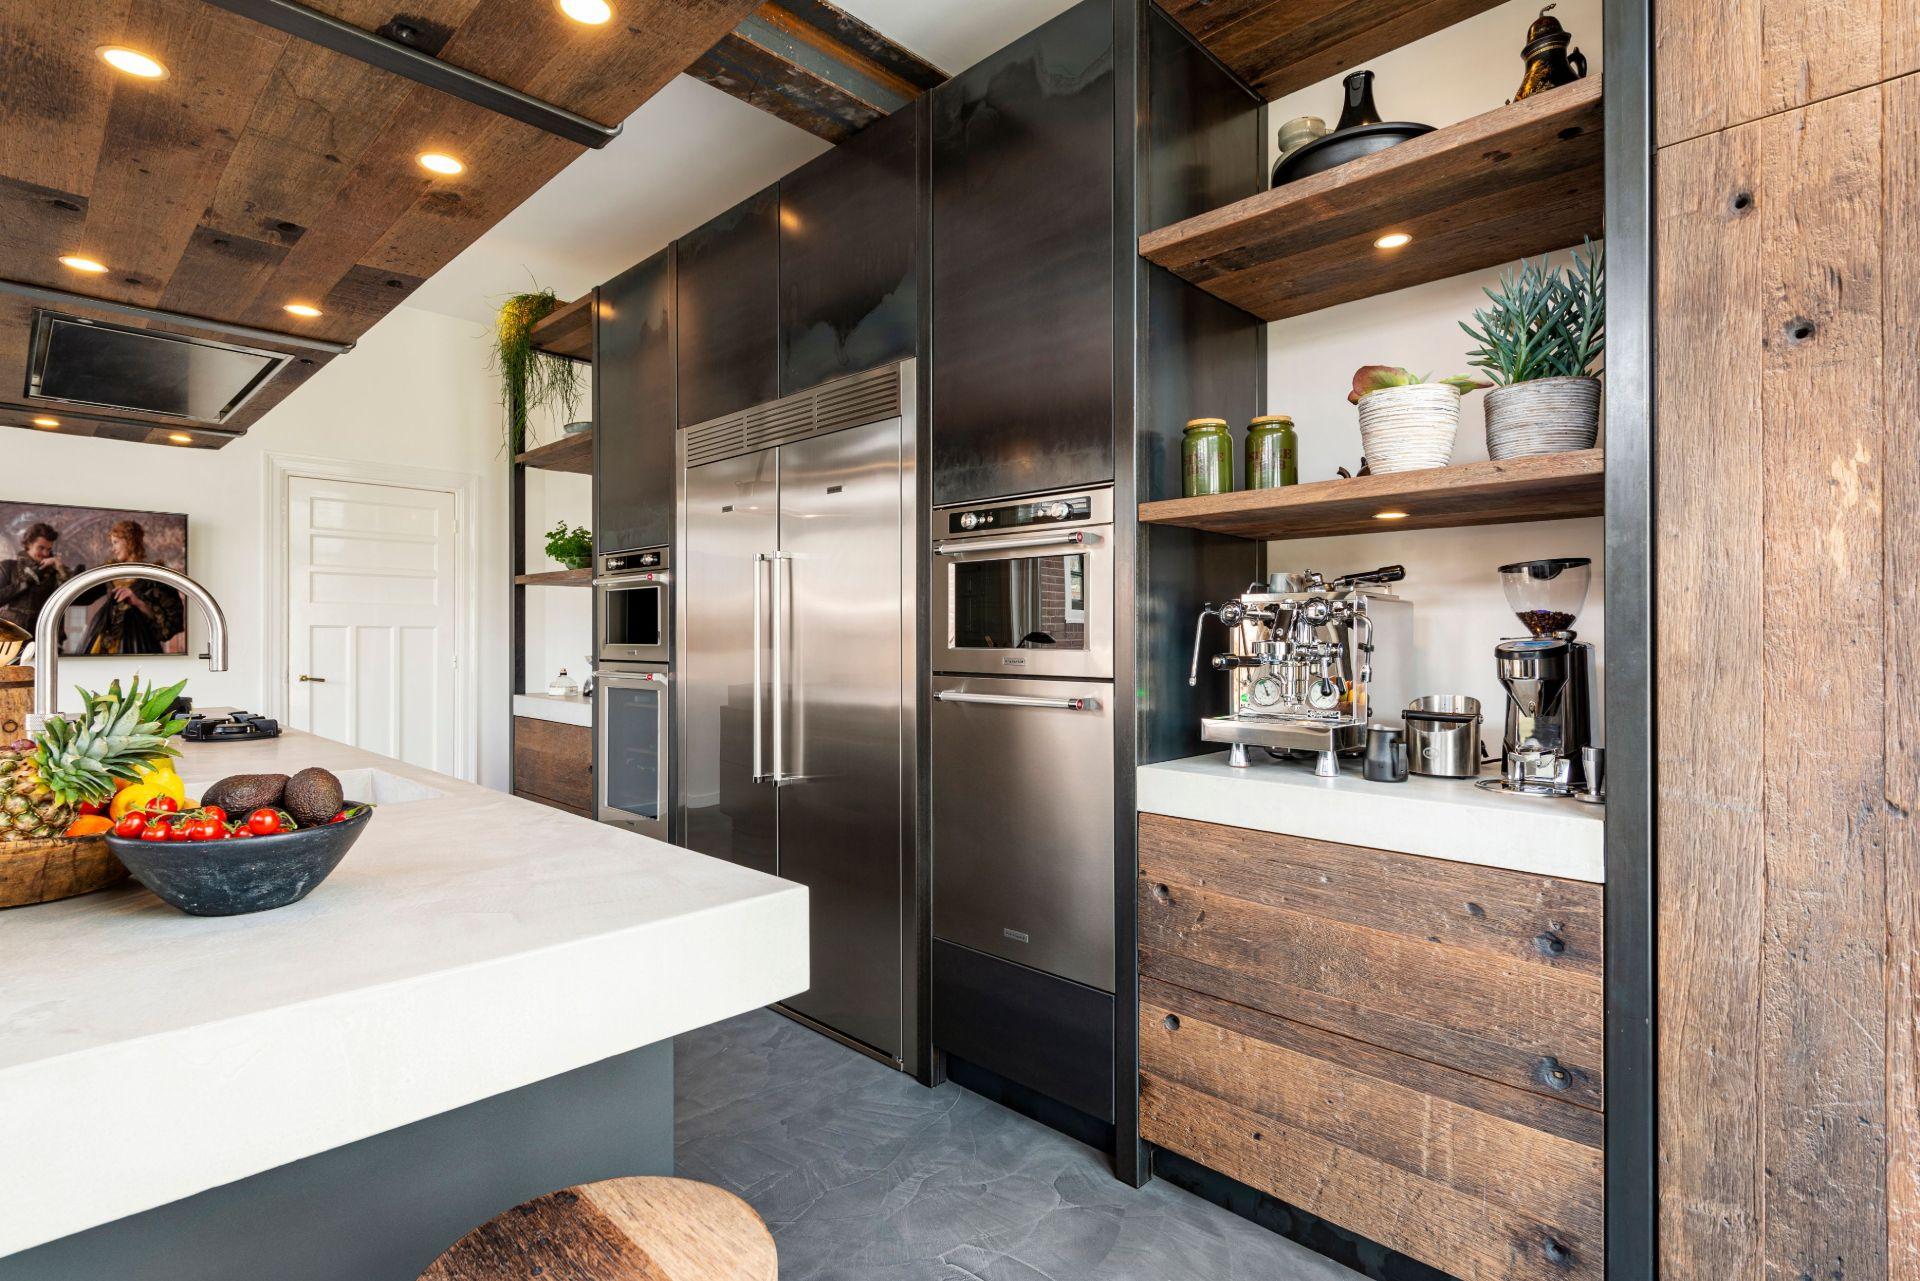 Industriele keuken hout en staal van RestyleXL. KitchenAid PittCooking Quooker #keuken